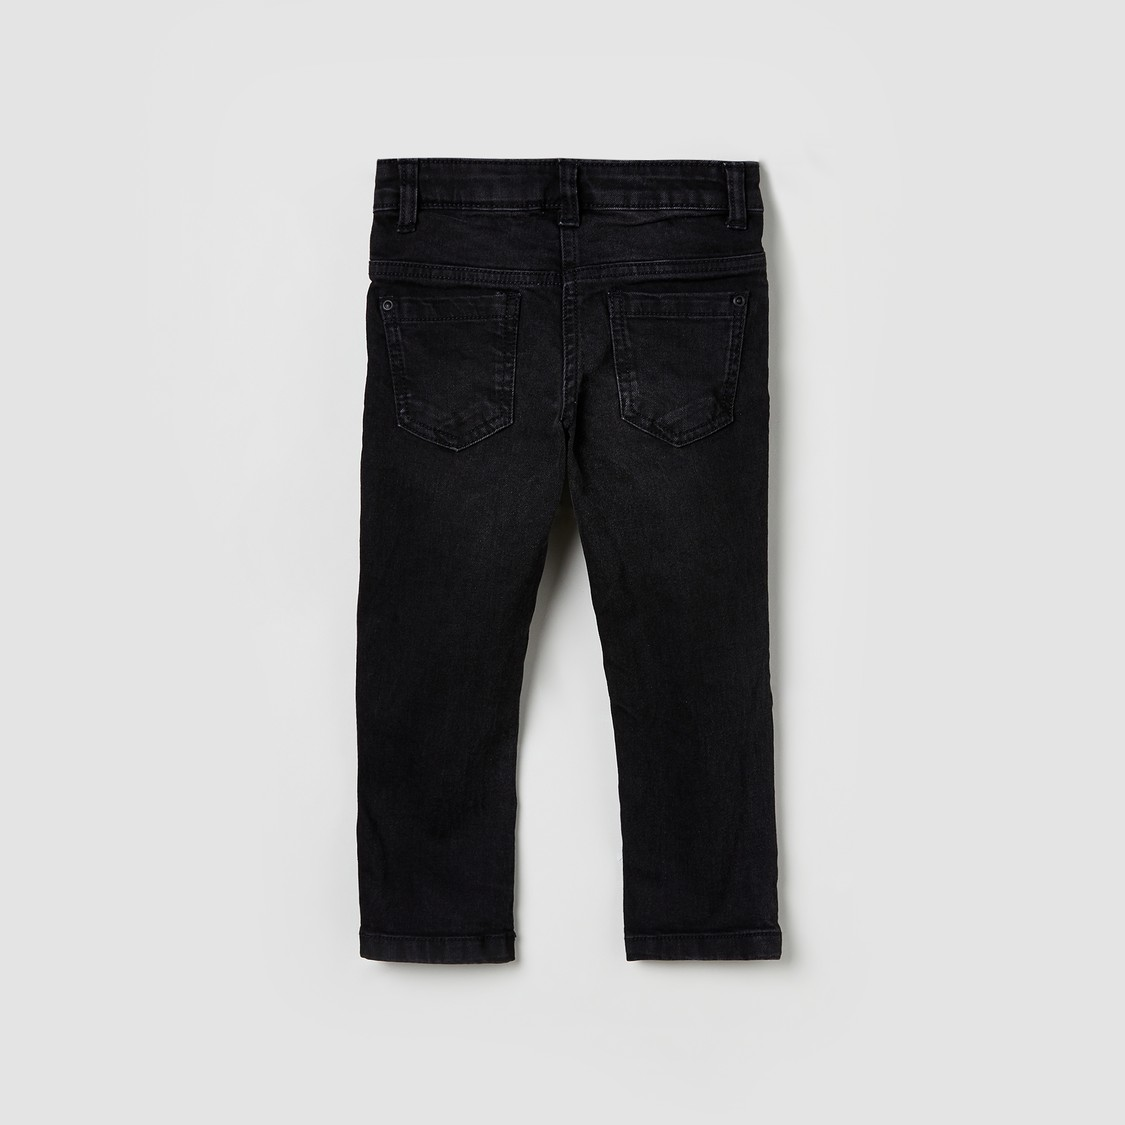 MAX Dark Washed 5-Pocket Jeans